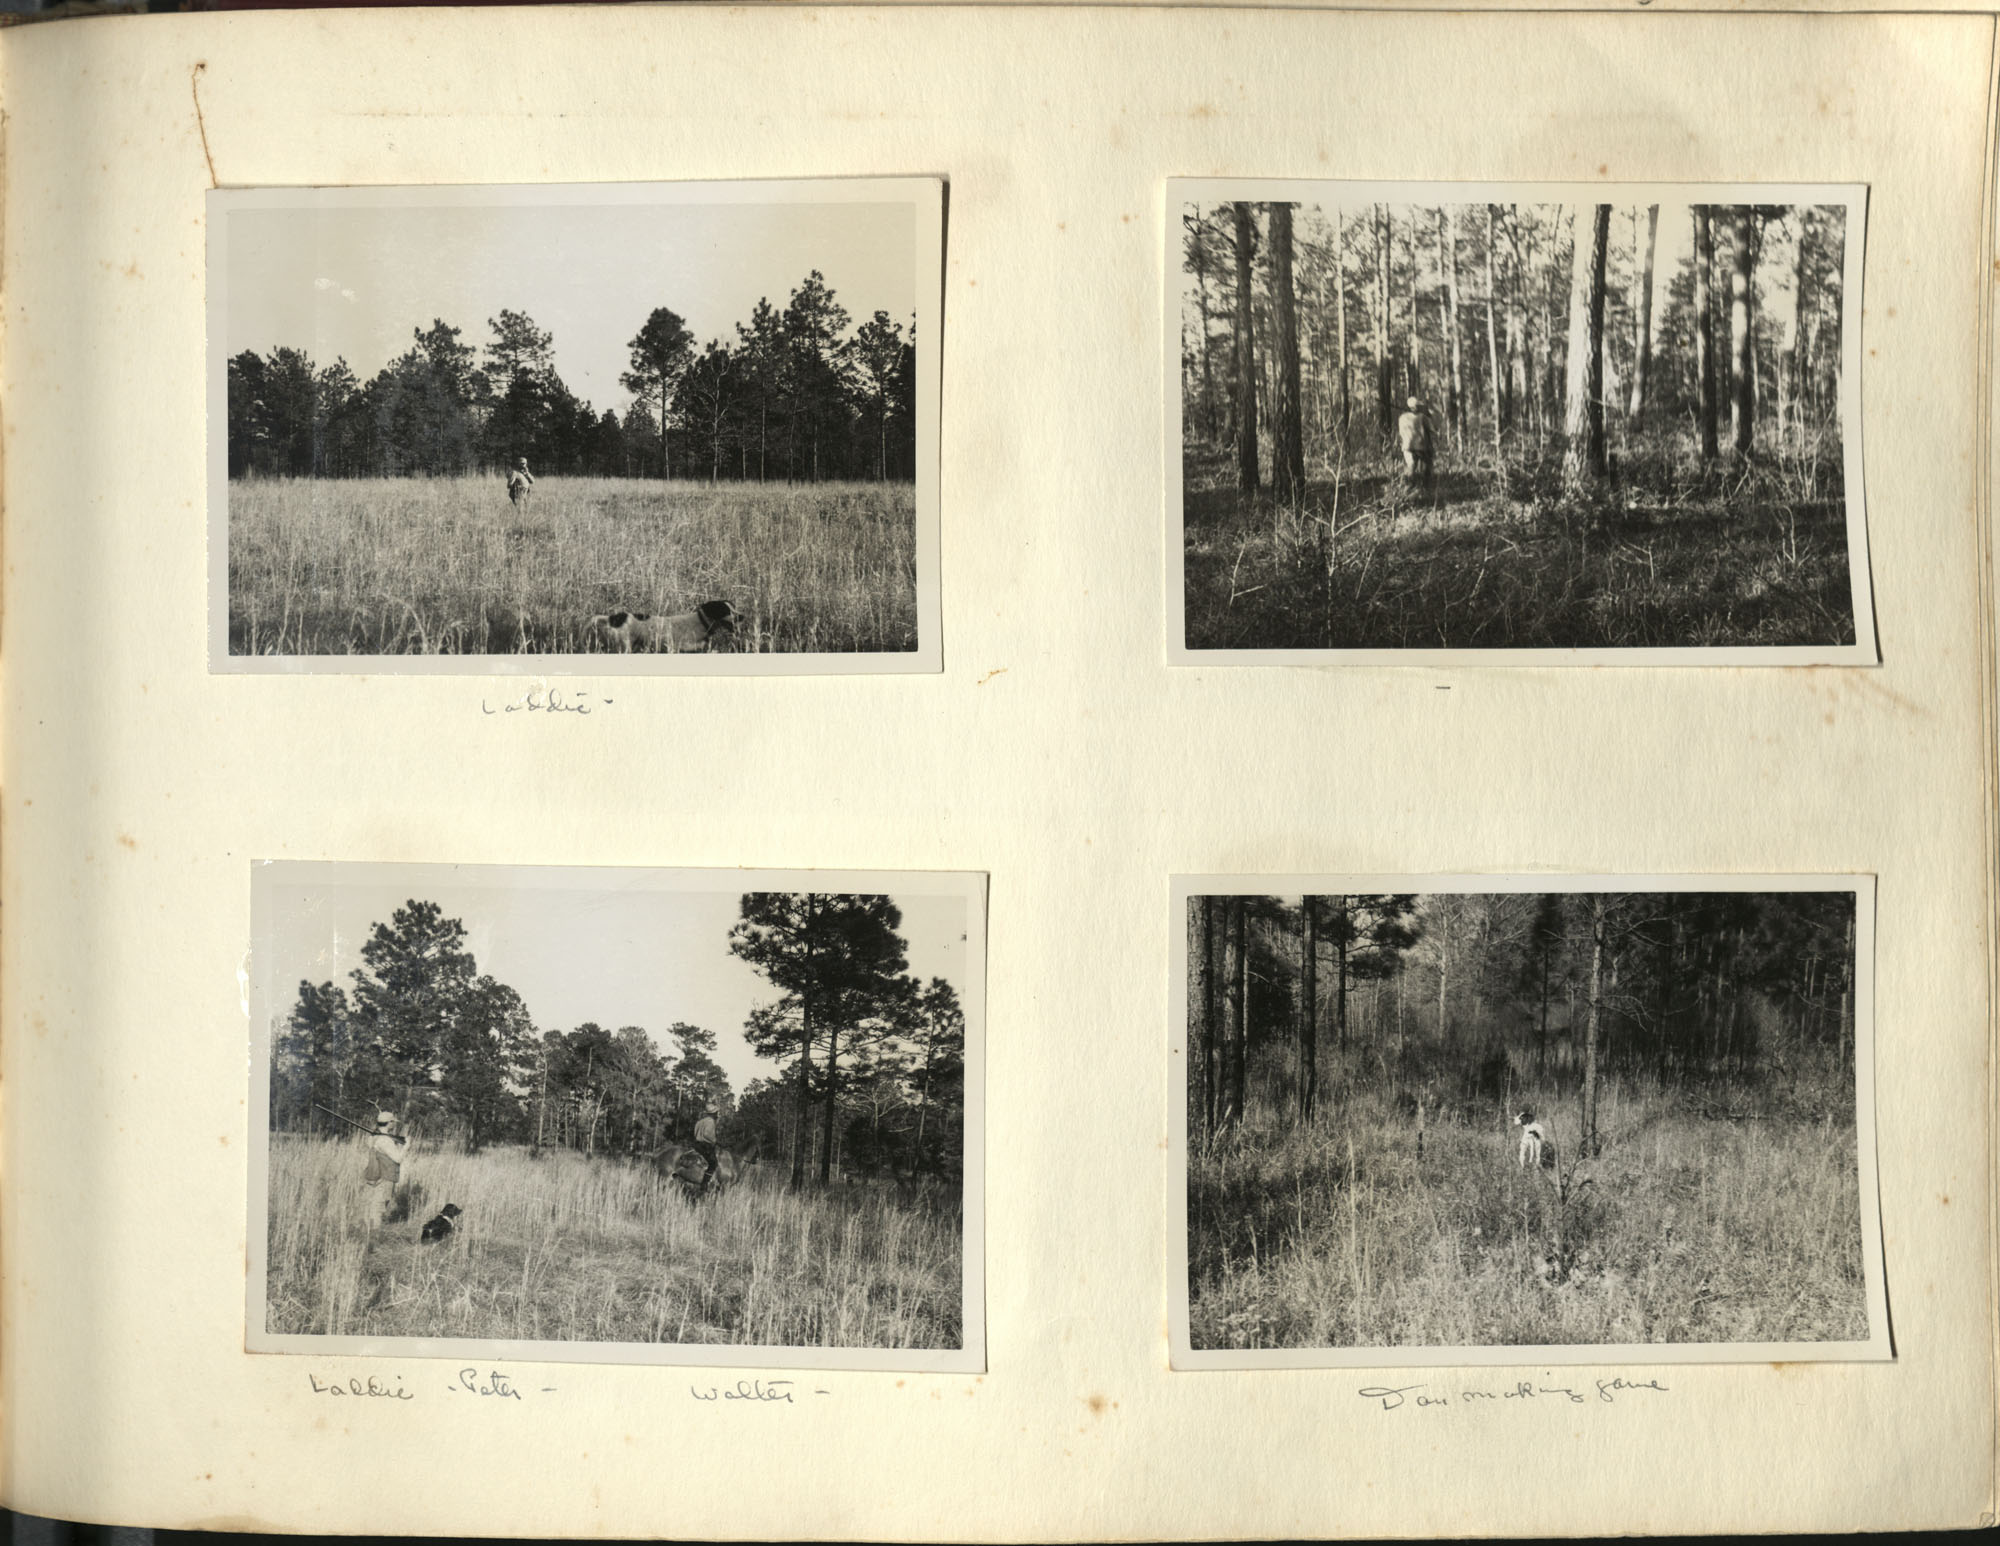 Medway Plantation Photograph Album, 1949, page 119